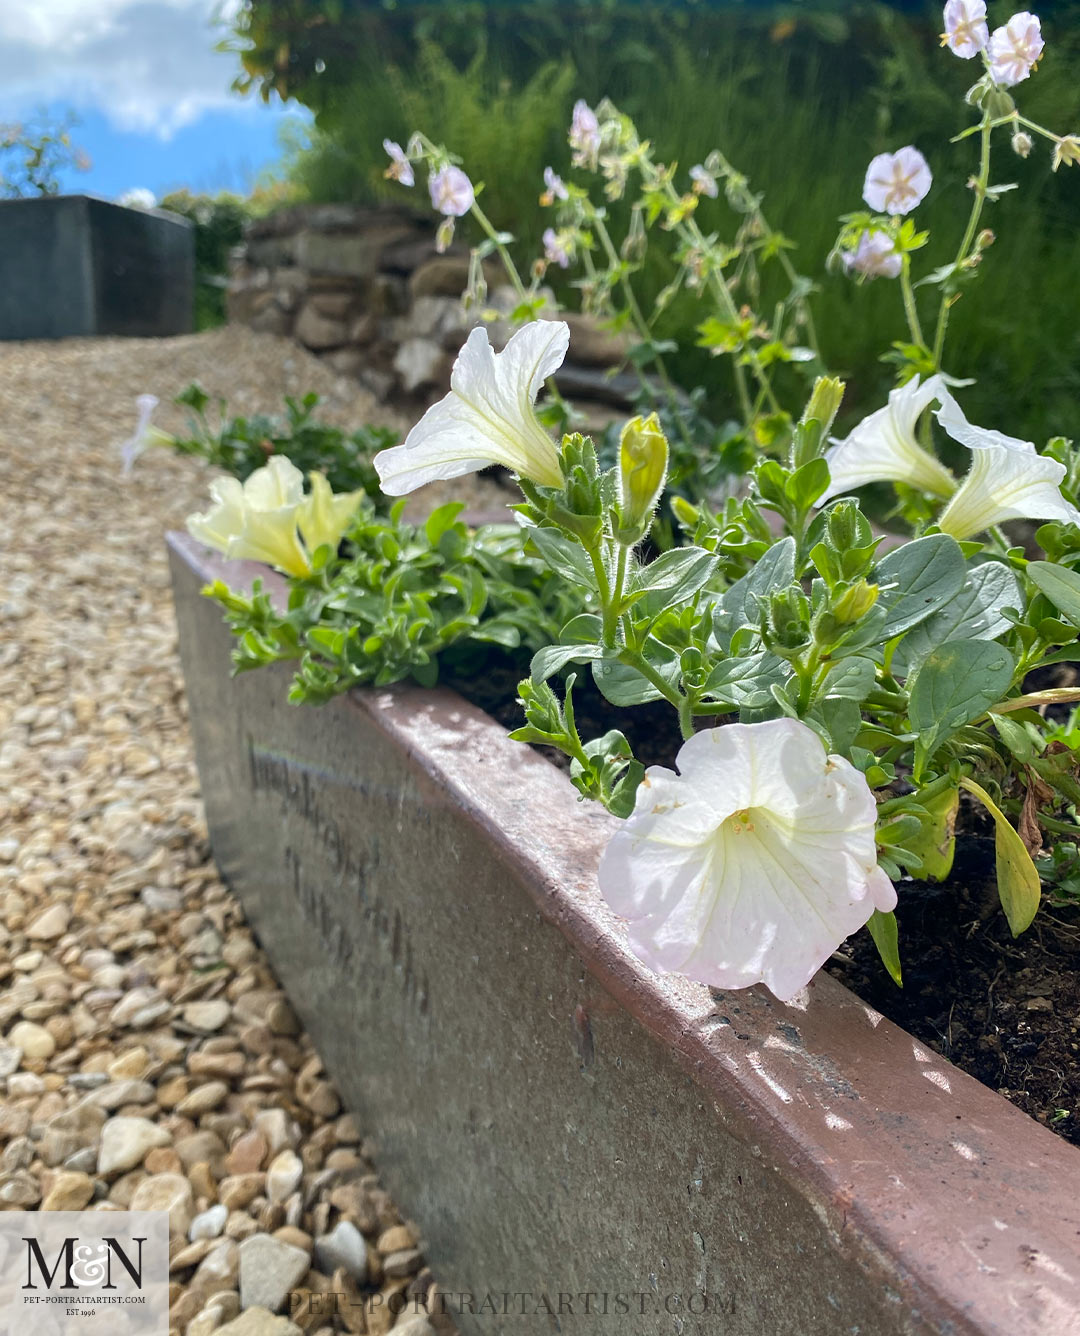 Melanie's May Monthly News - petunias